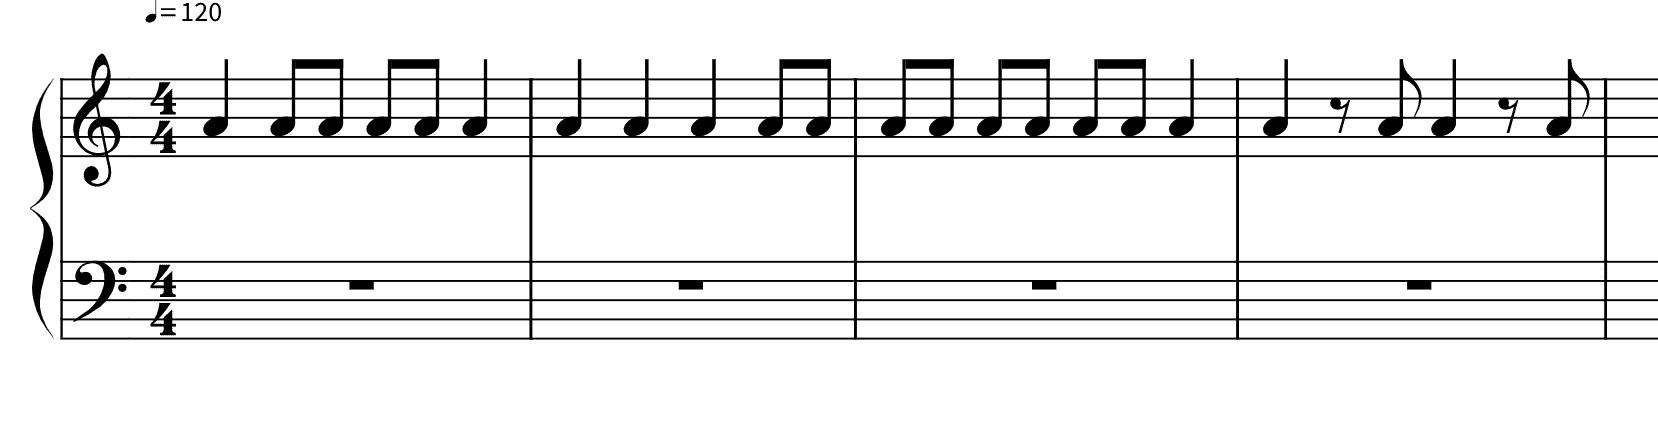 snare drum music